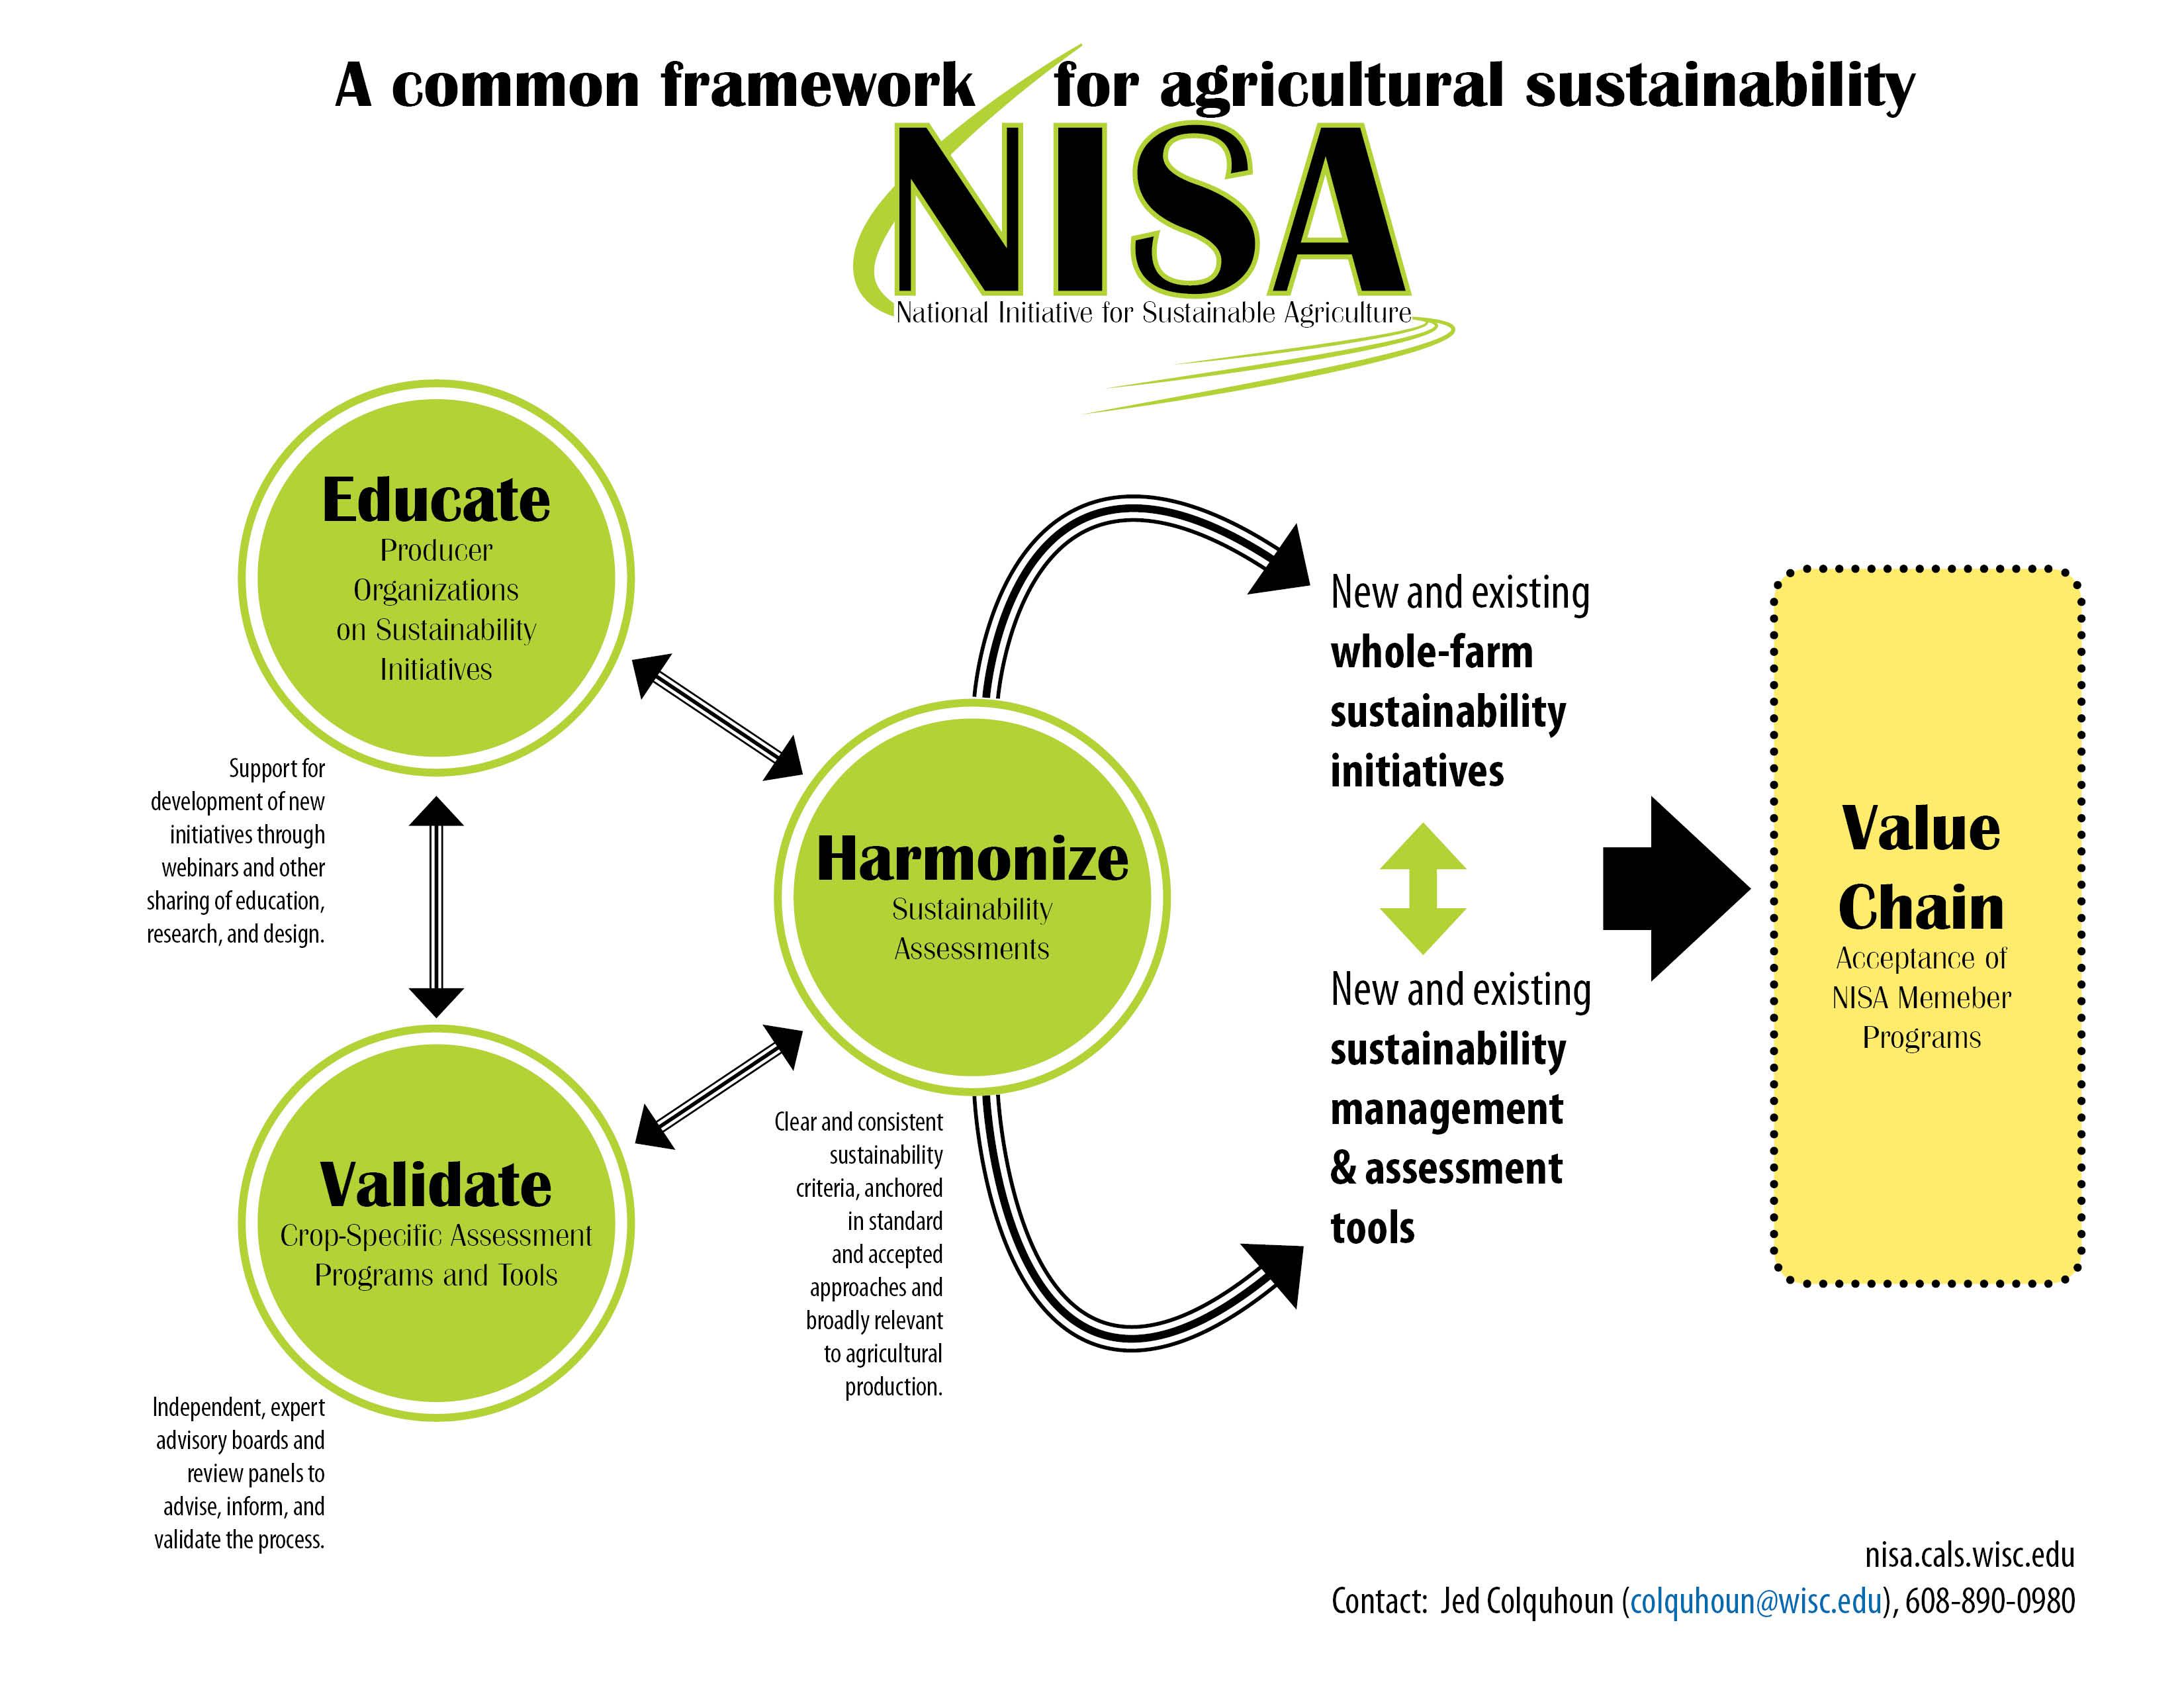 NISA_organizational_01_28_2013